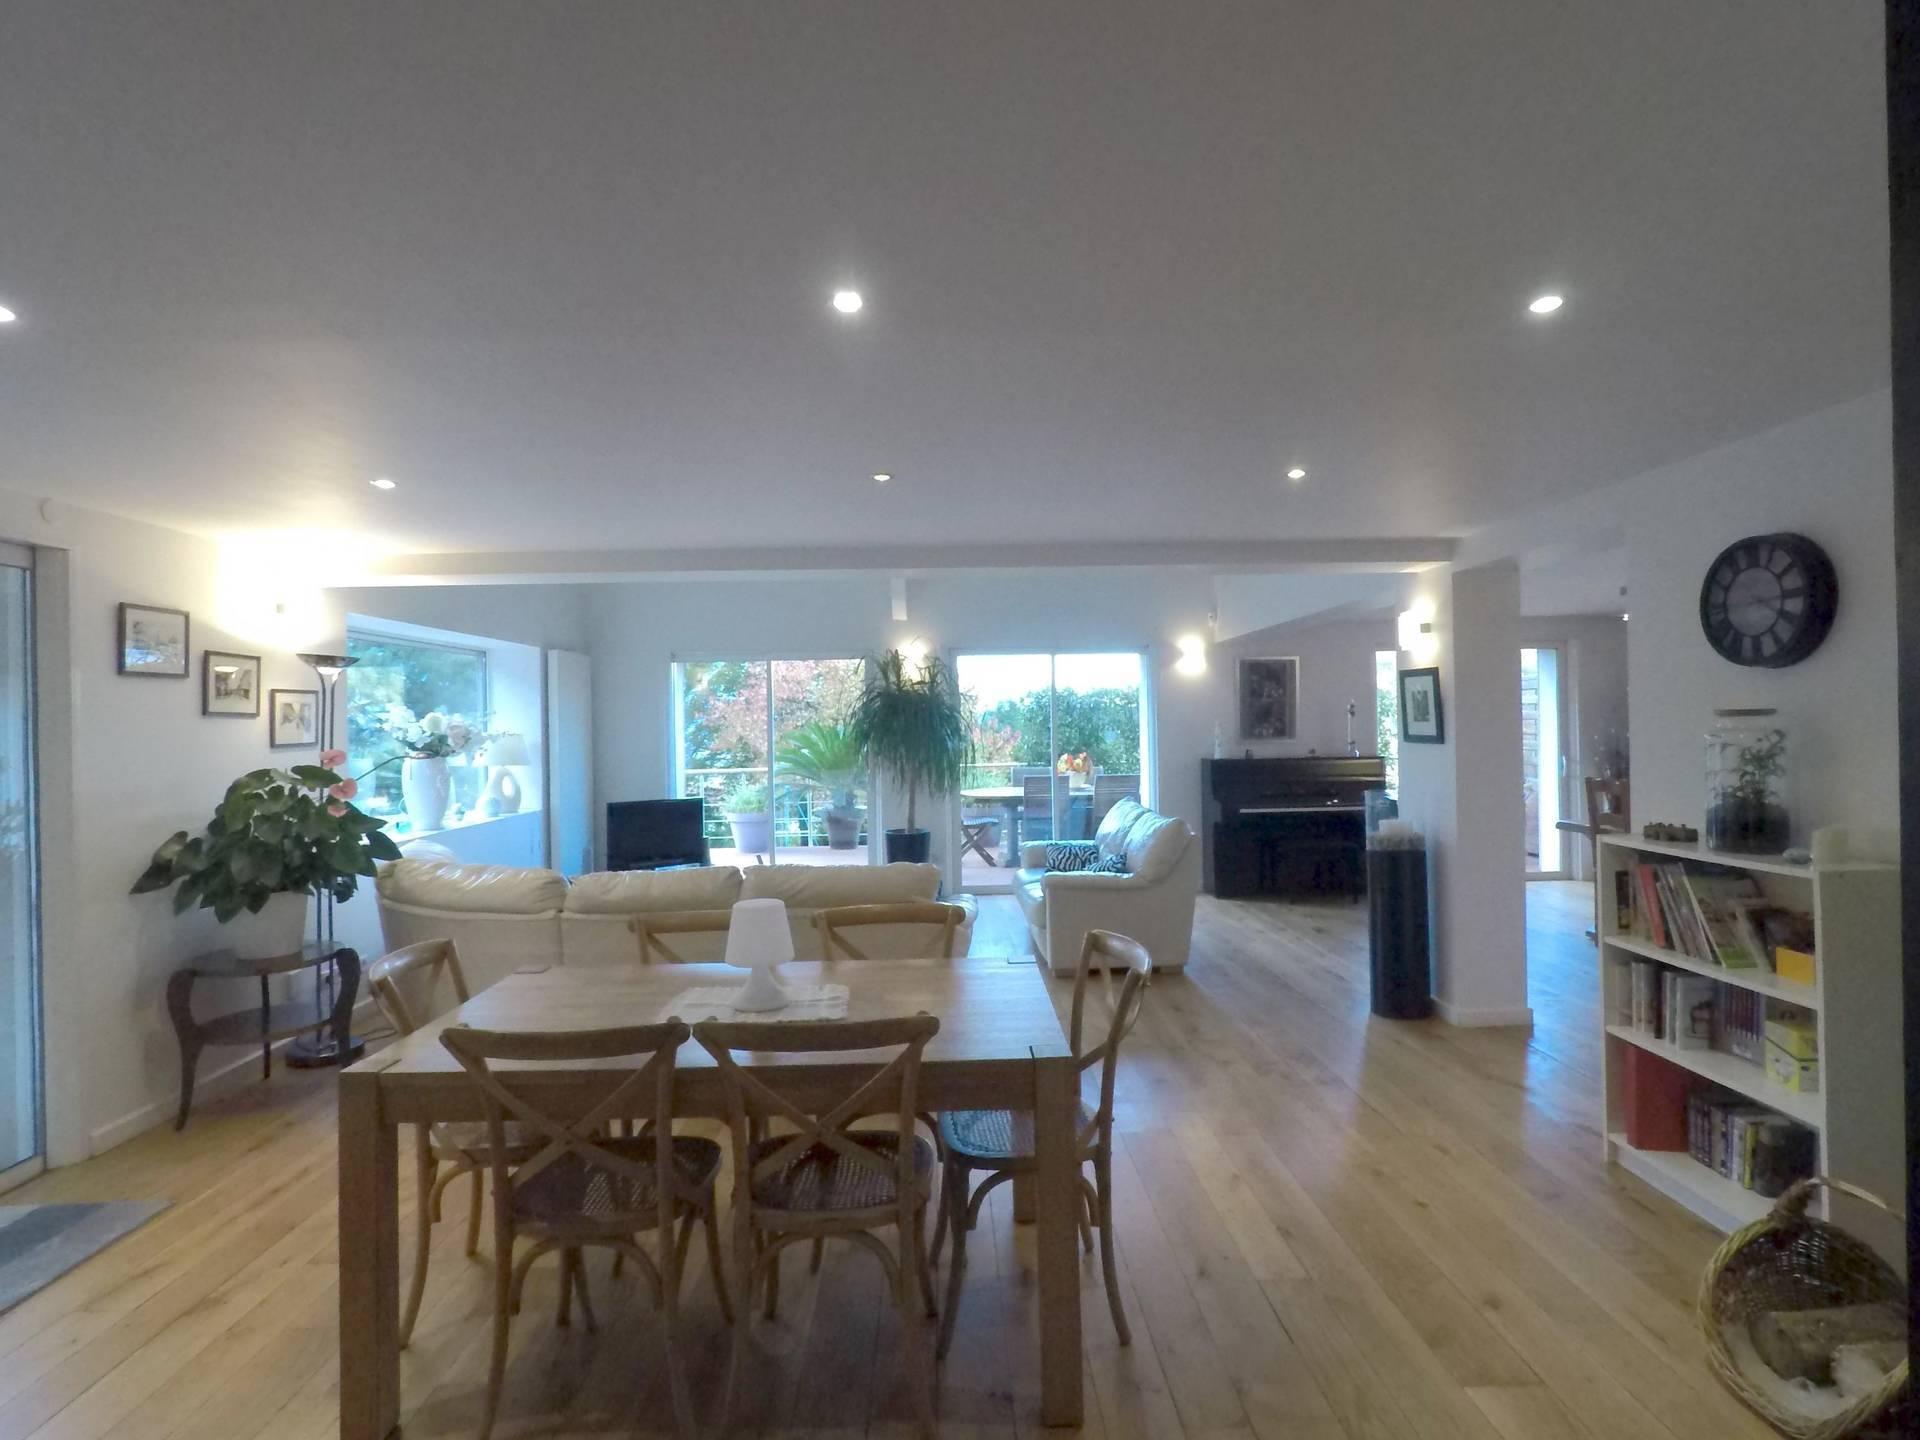 Vente Maison Villa 8 Pieces 271 13 M Eybens 38320